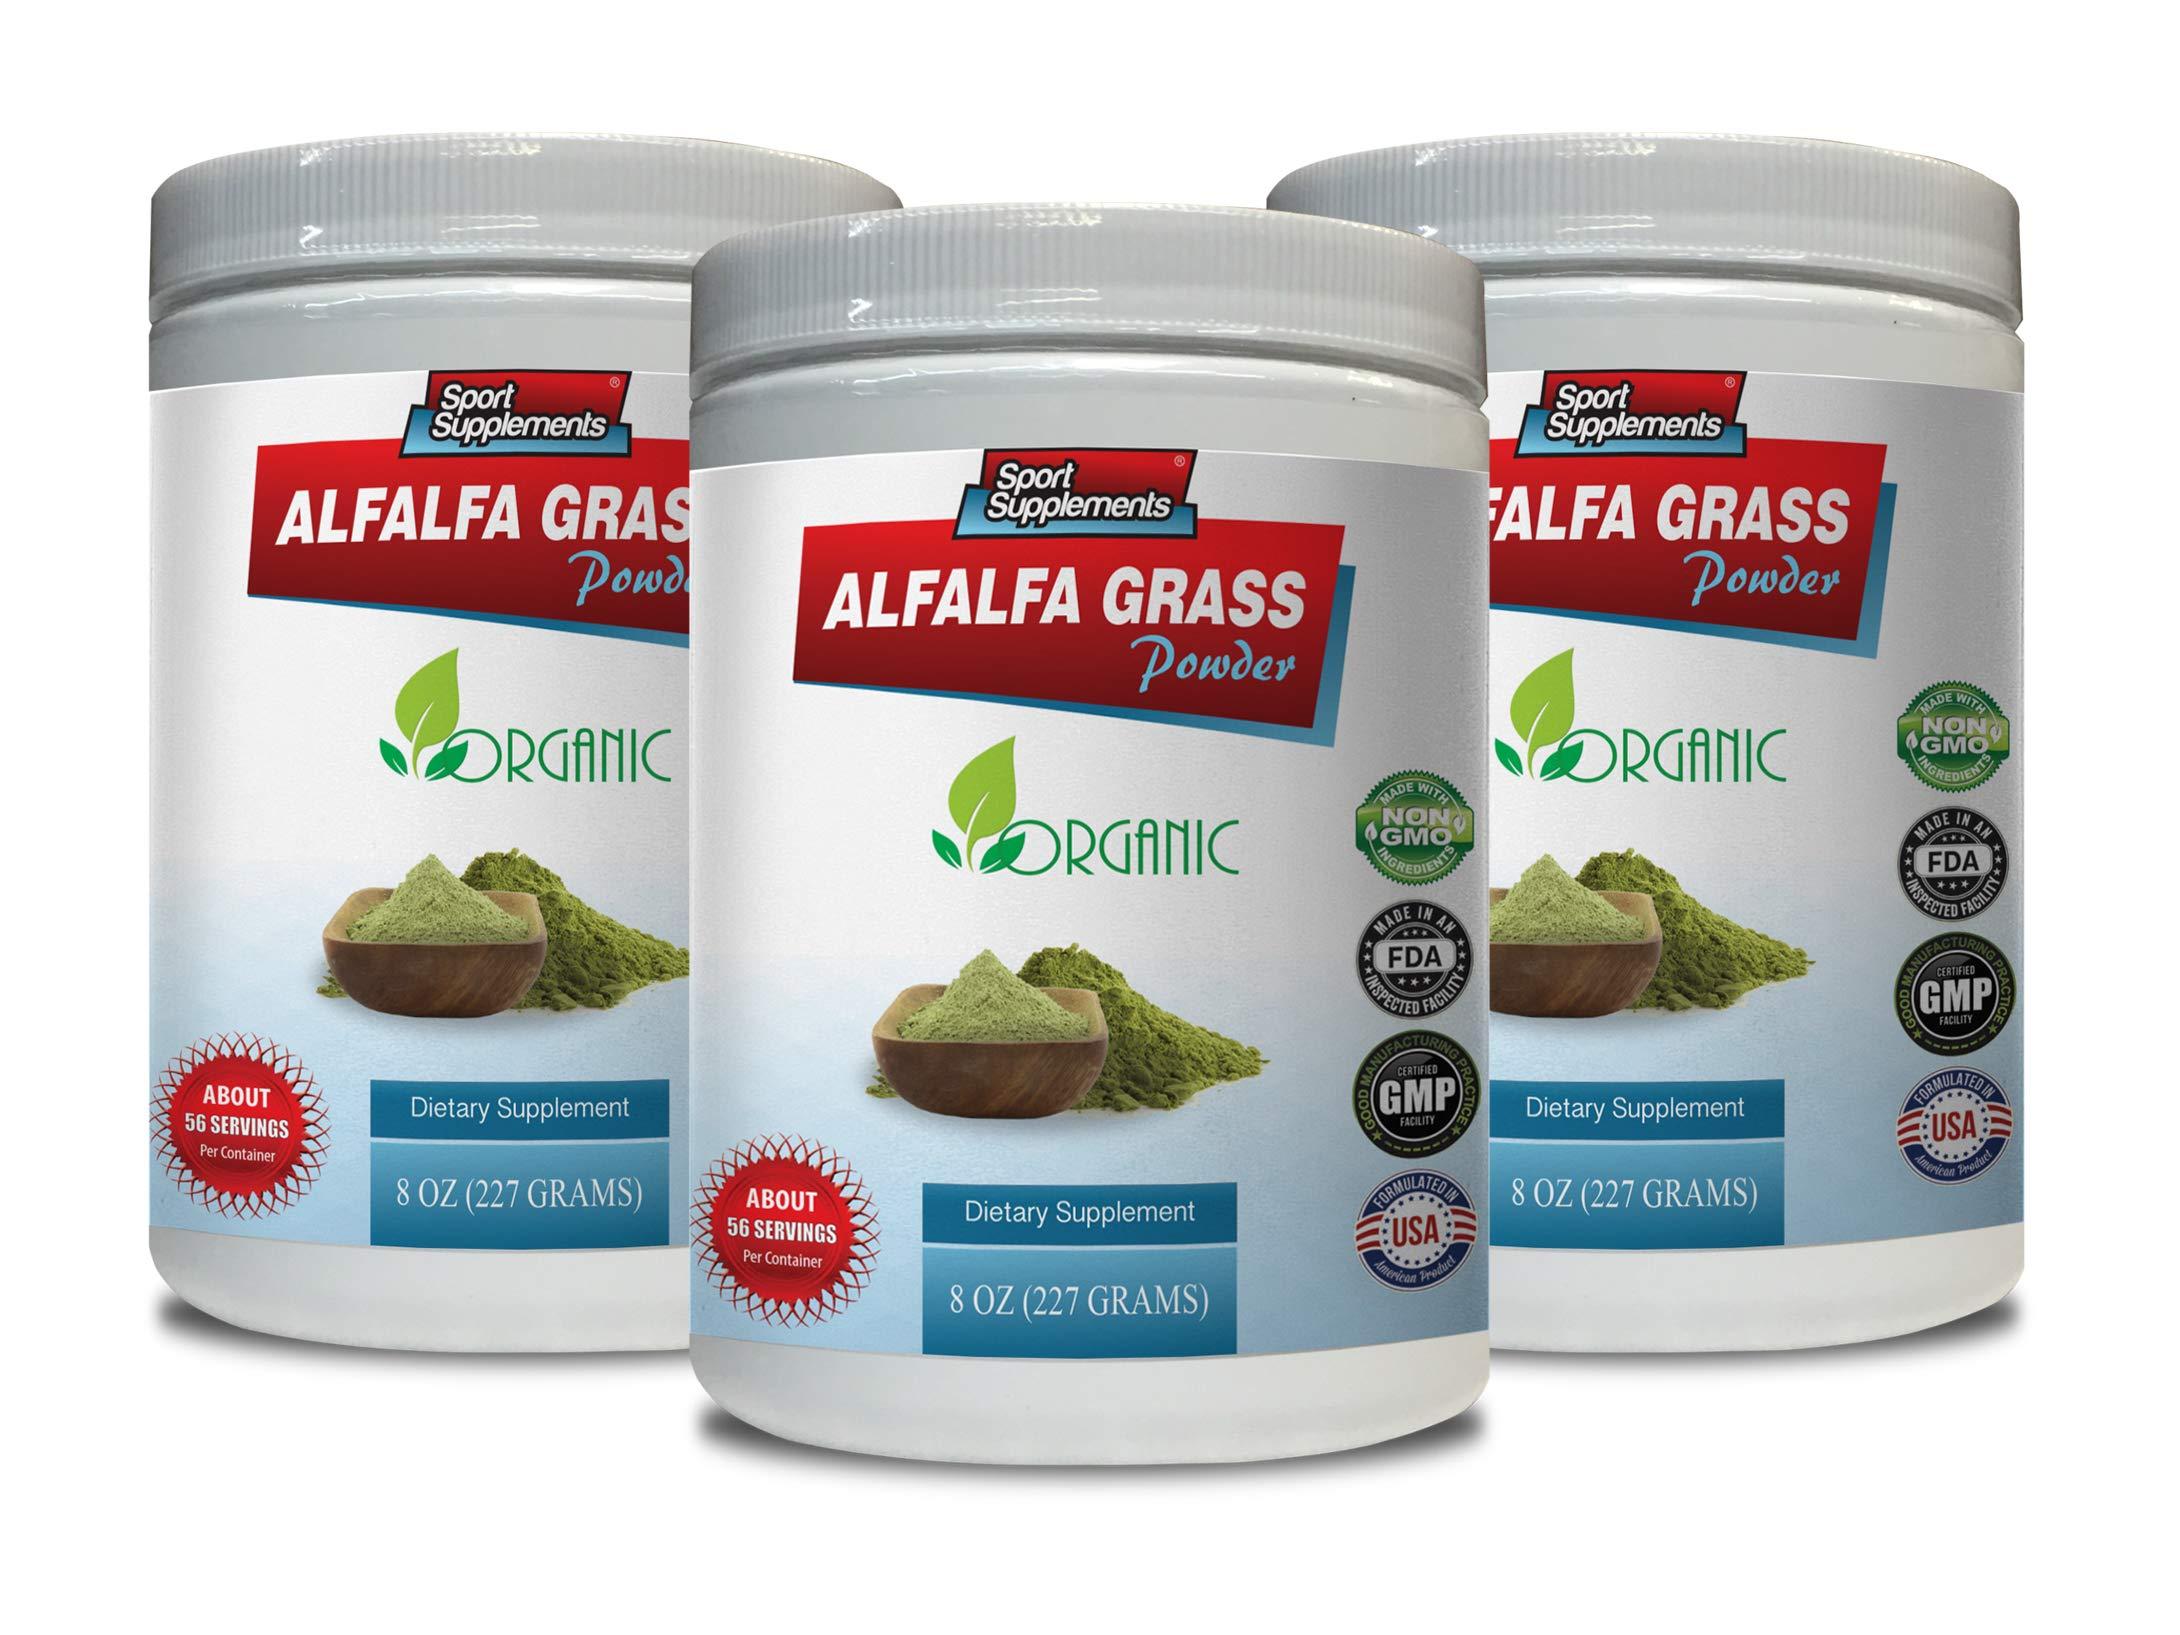 antioxidant Booster Powder - Alfalfa Grass Powder - Organic Dietary Supplement - Digestion Powder - 3 Cans 24 OZ (168 Servings)